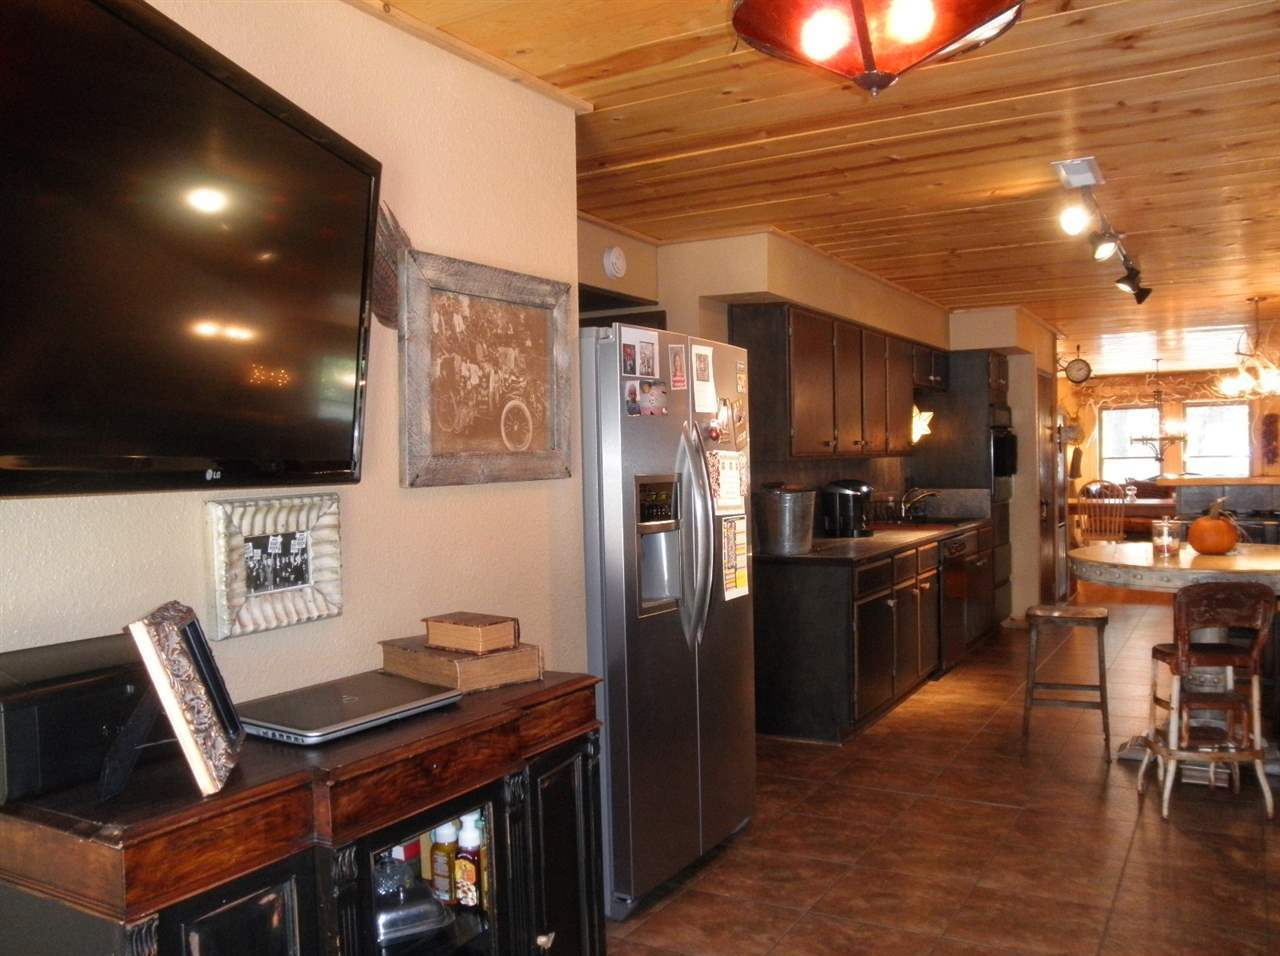 Sold Cross Sale W/ MLS | 54 Pike Lane  Ponca City, OK 74604 8